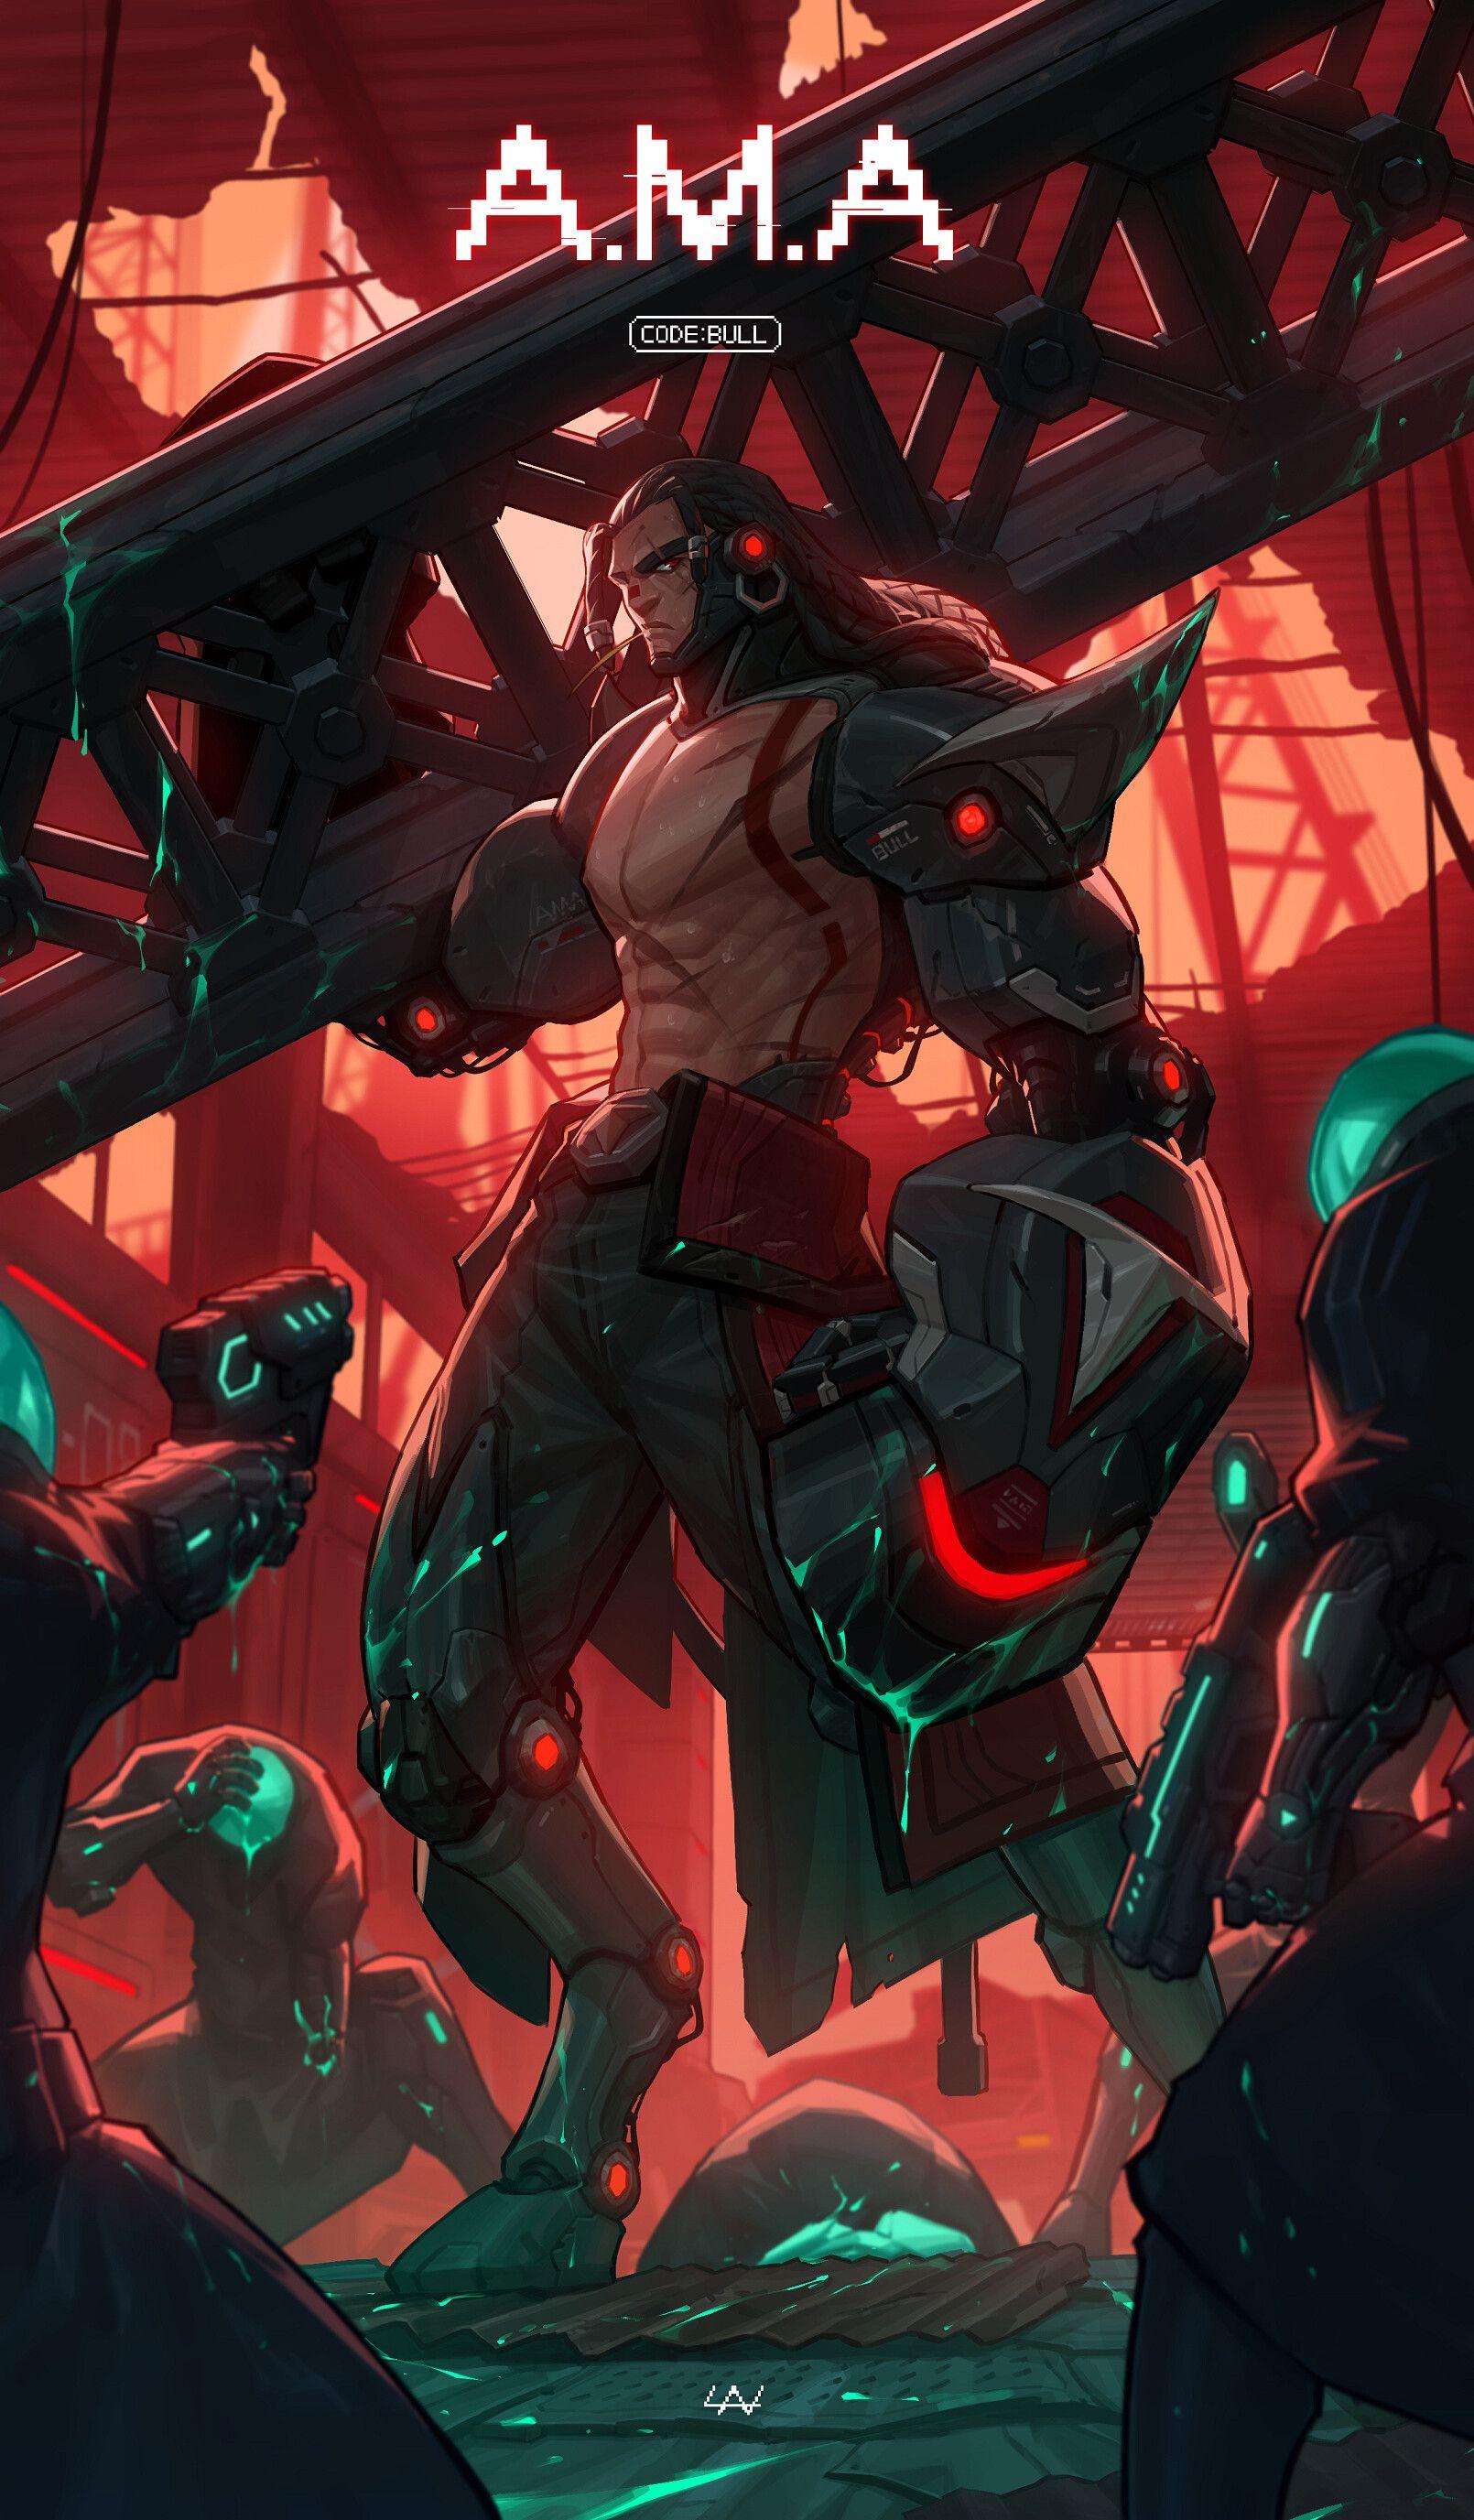 ArtStation BULL, Lan Space anime, Cyberpunk art